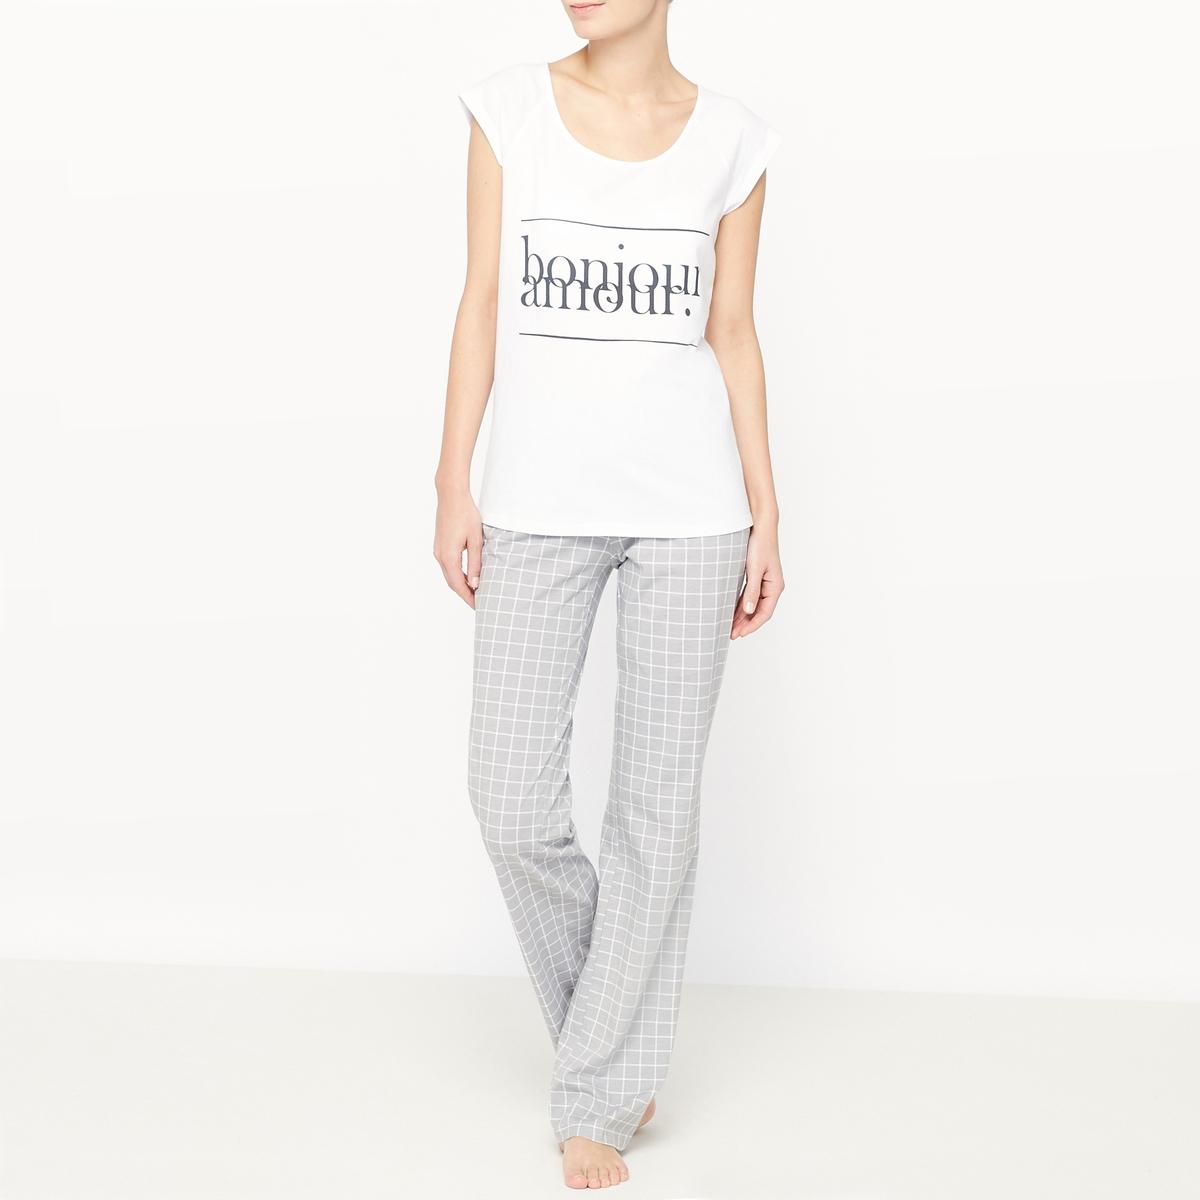 Пижама из хлопка с короткими рукавами